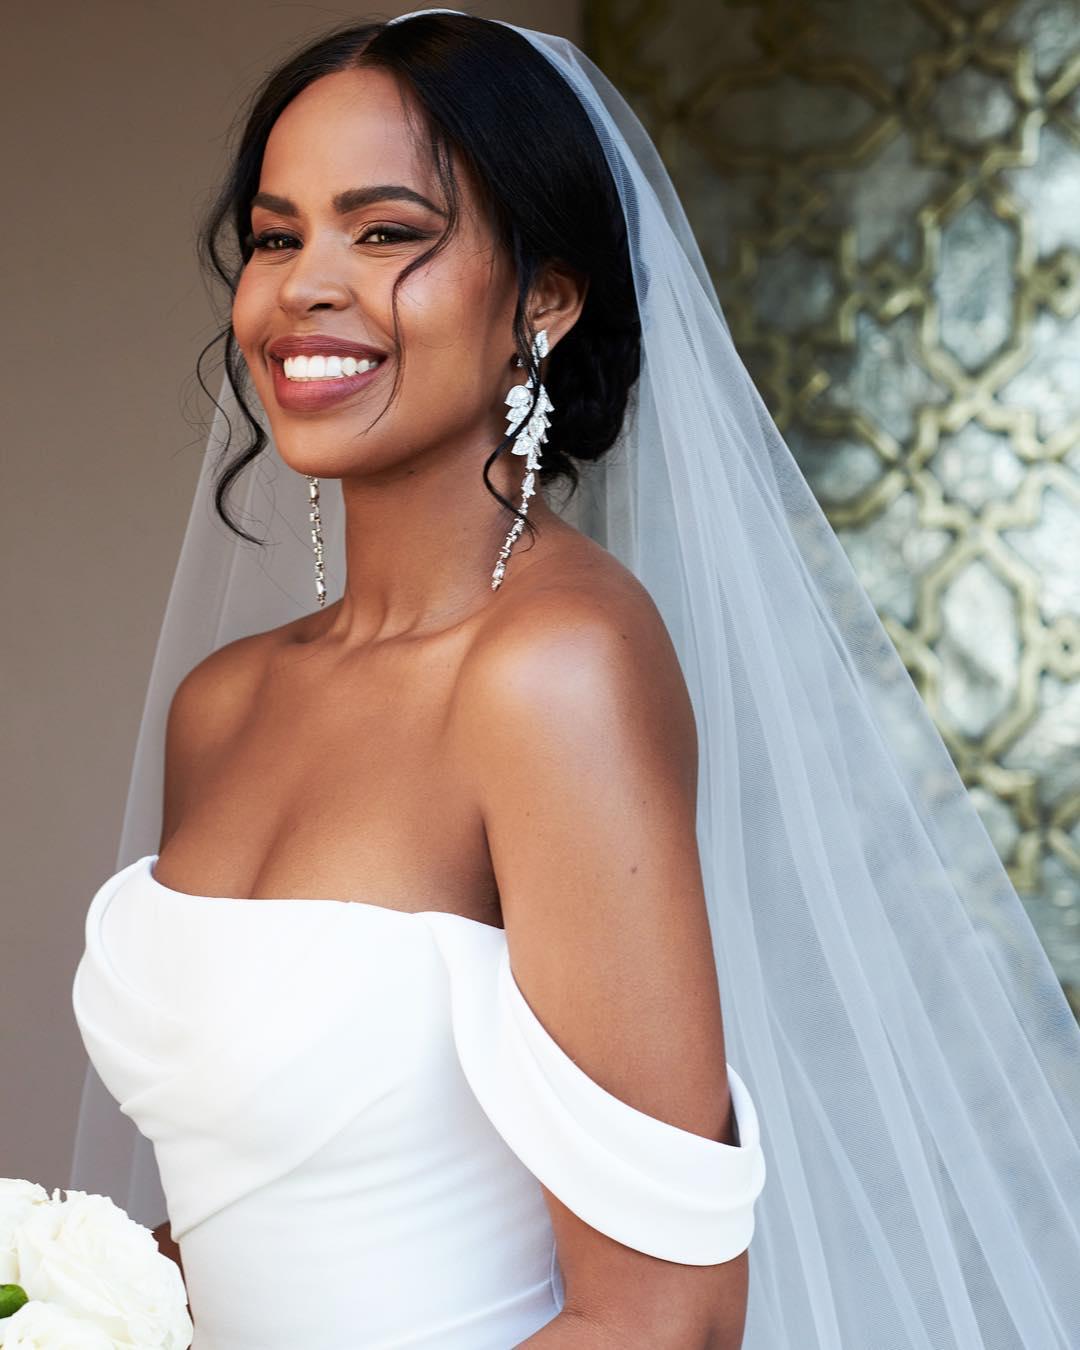 idris-elba-casamento-noiva